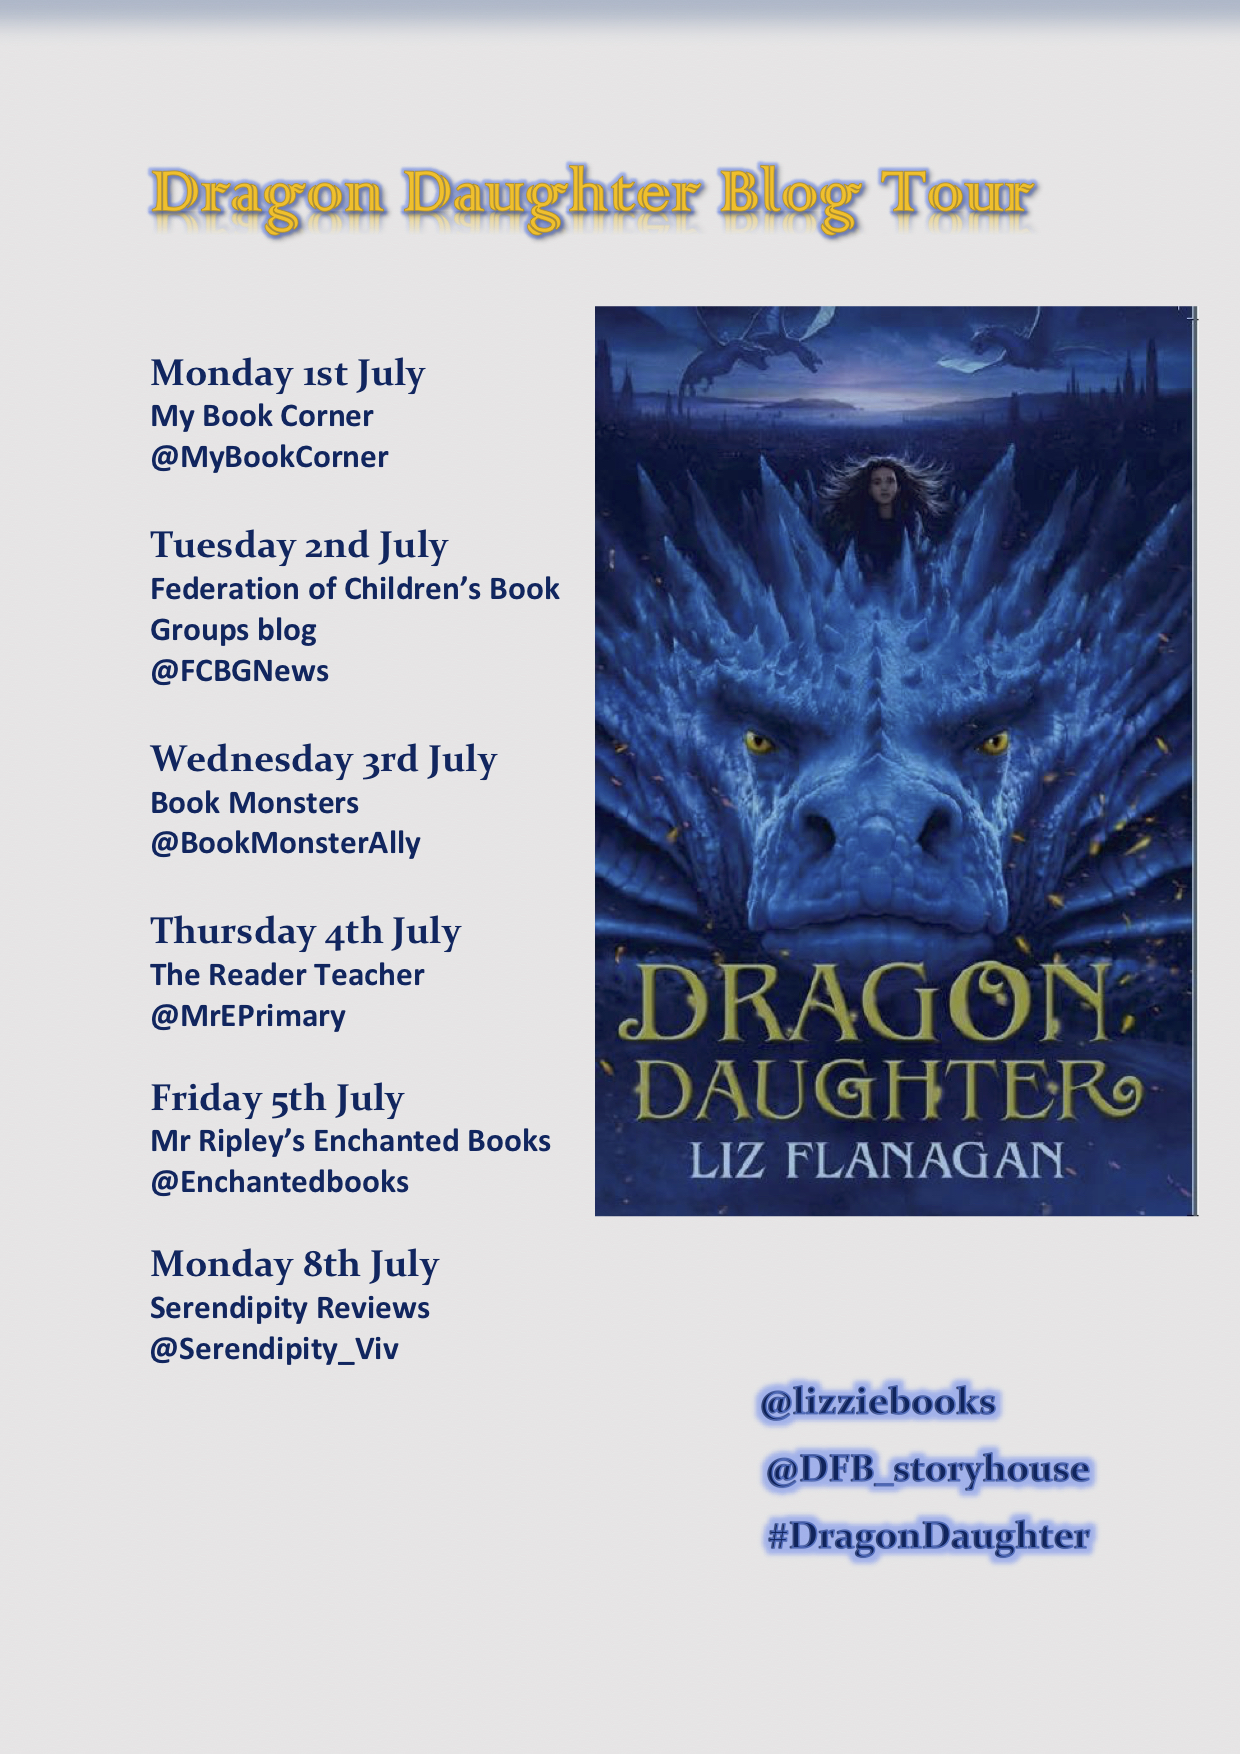 Dragon Daughter blog tour poster